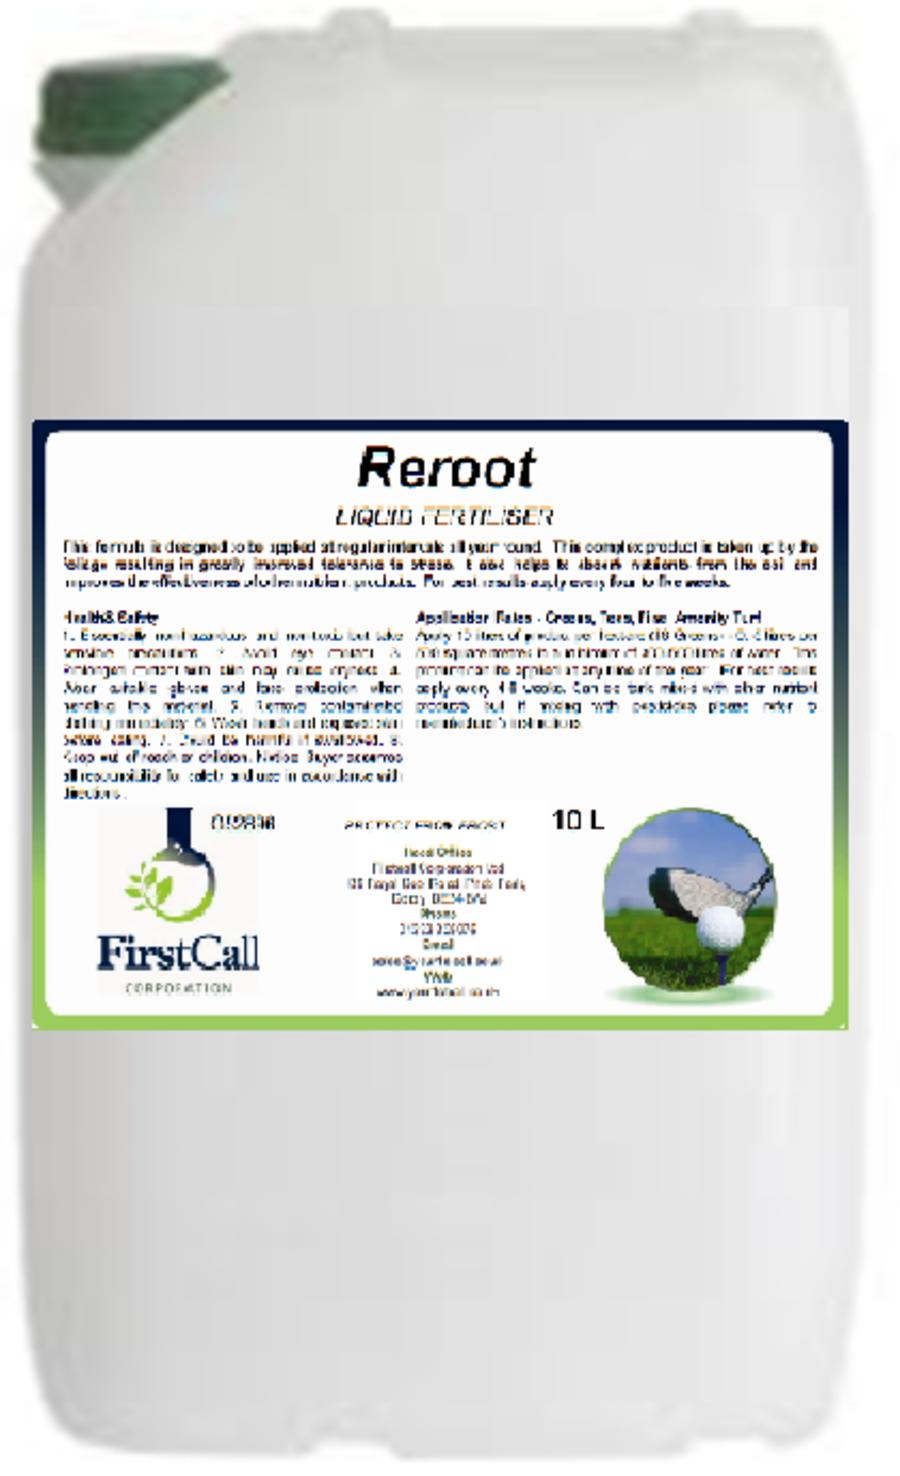 Re-Root